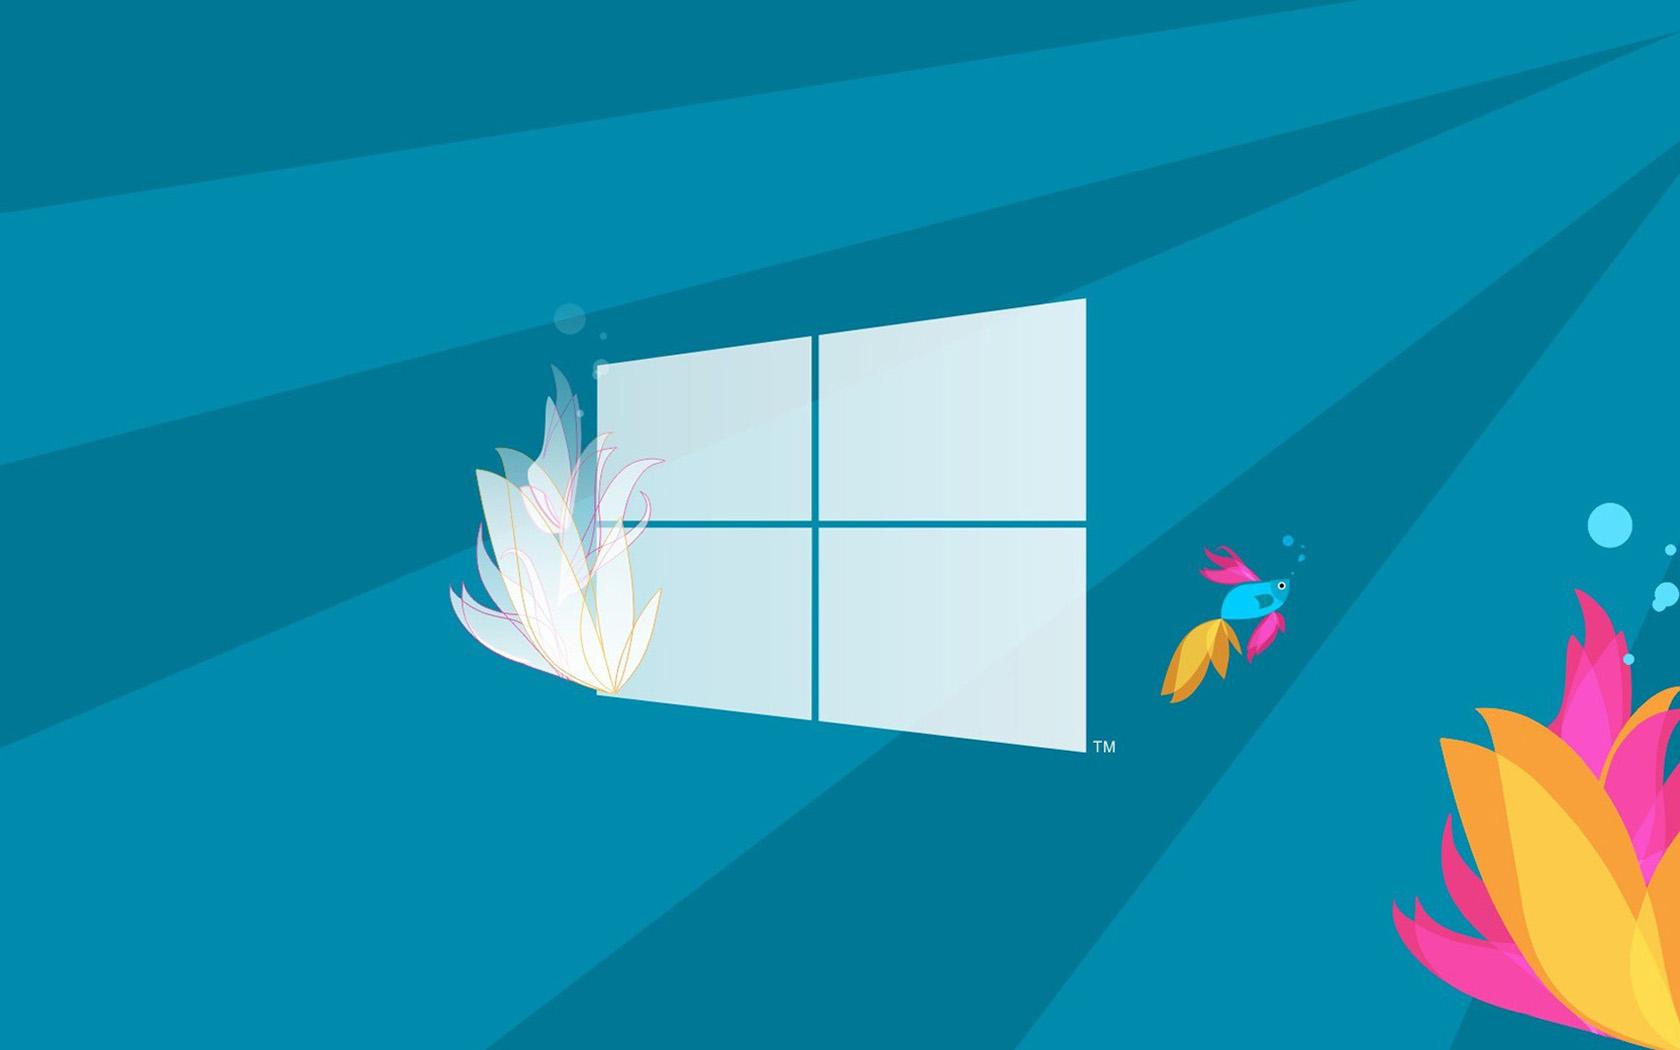 Windows 8 official minimalist wallpaper HD Wallpaper Downloads 1680x1050